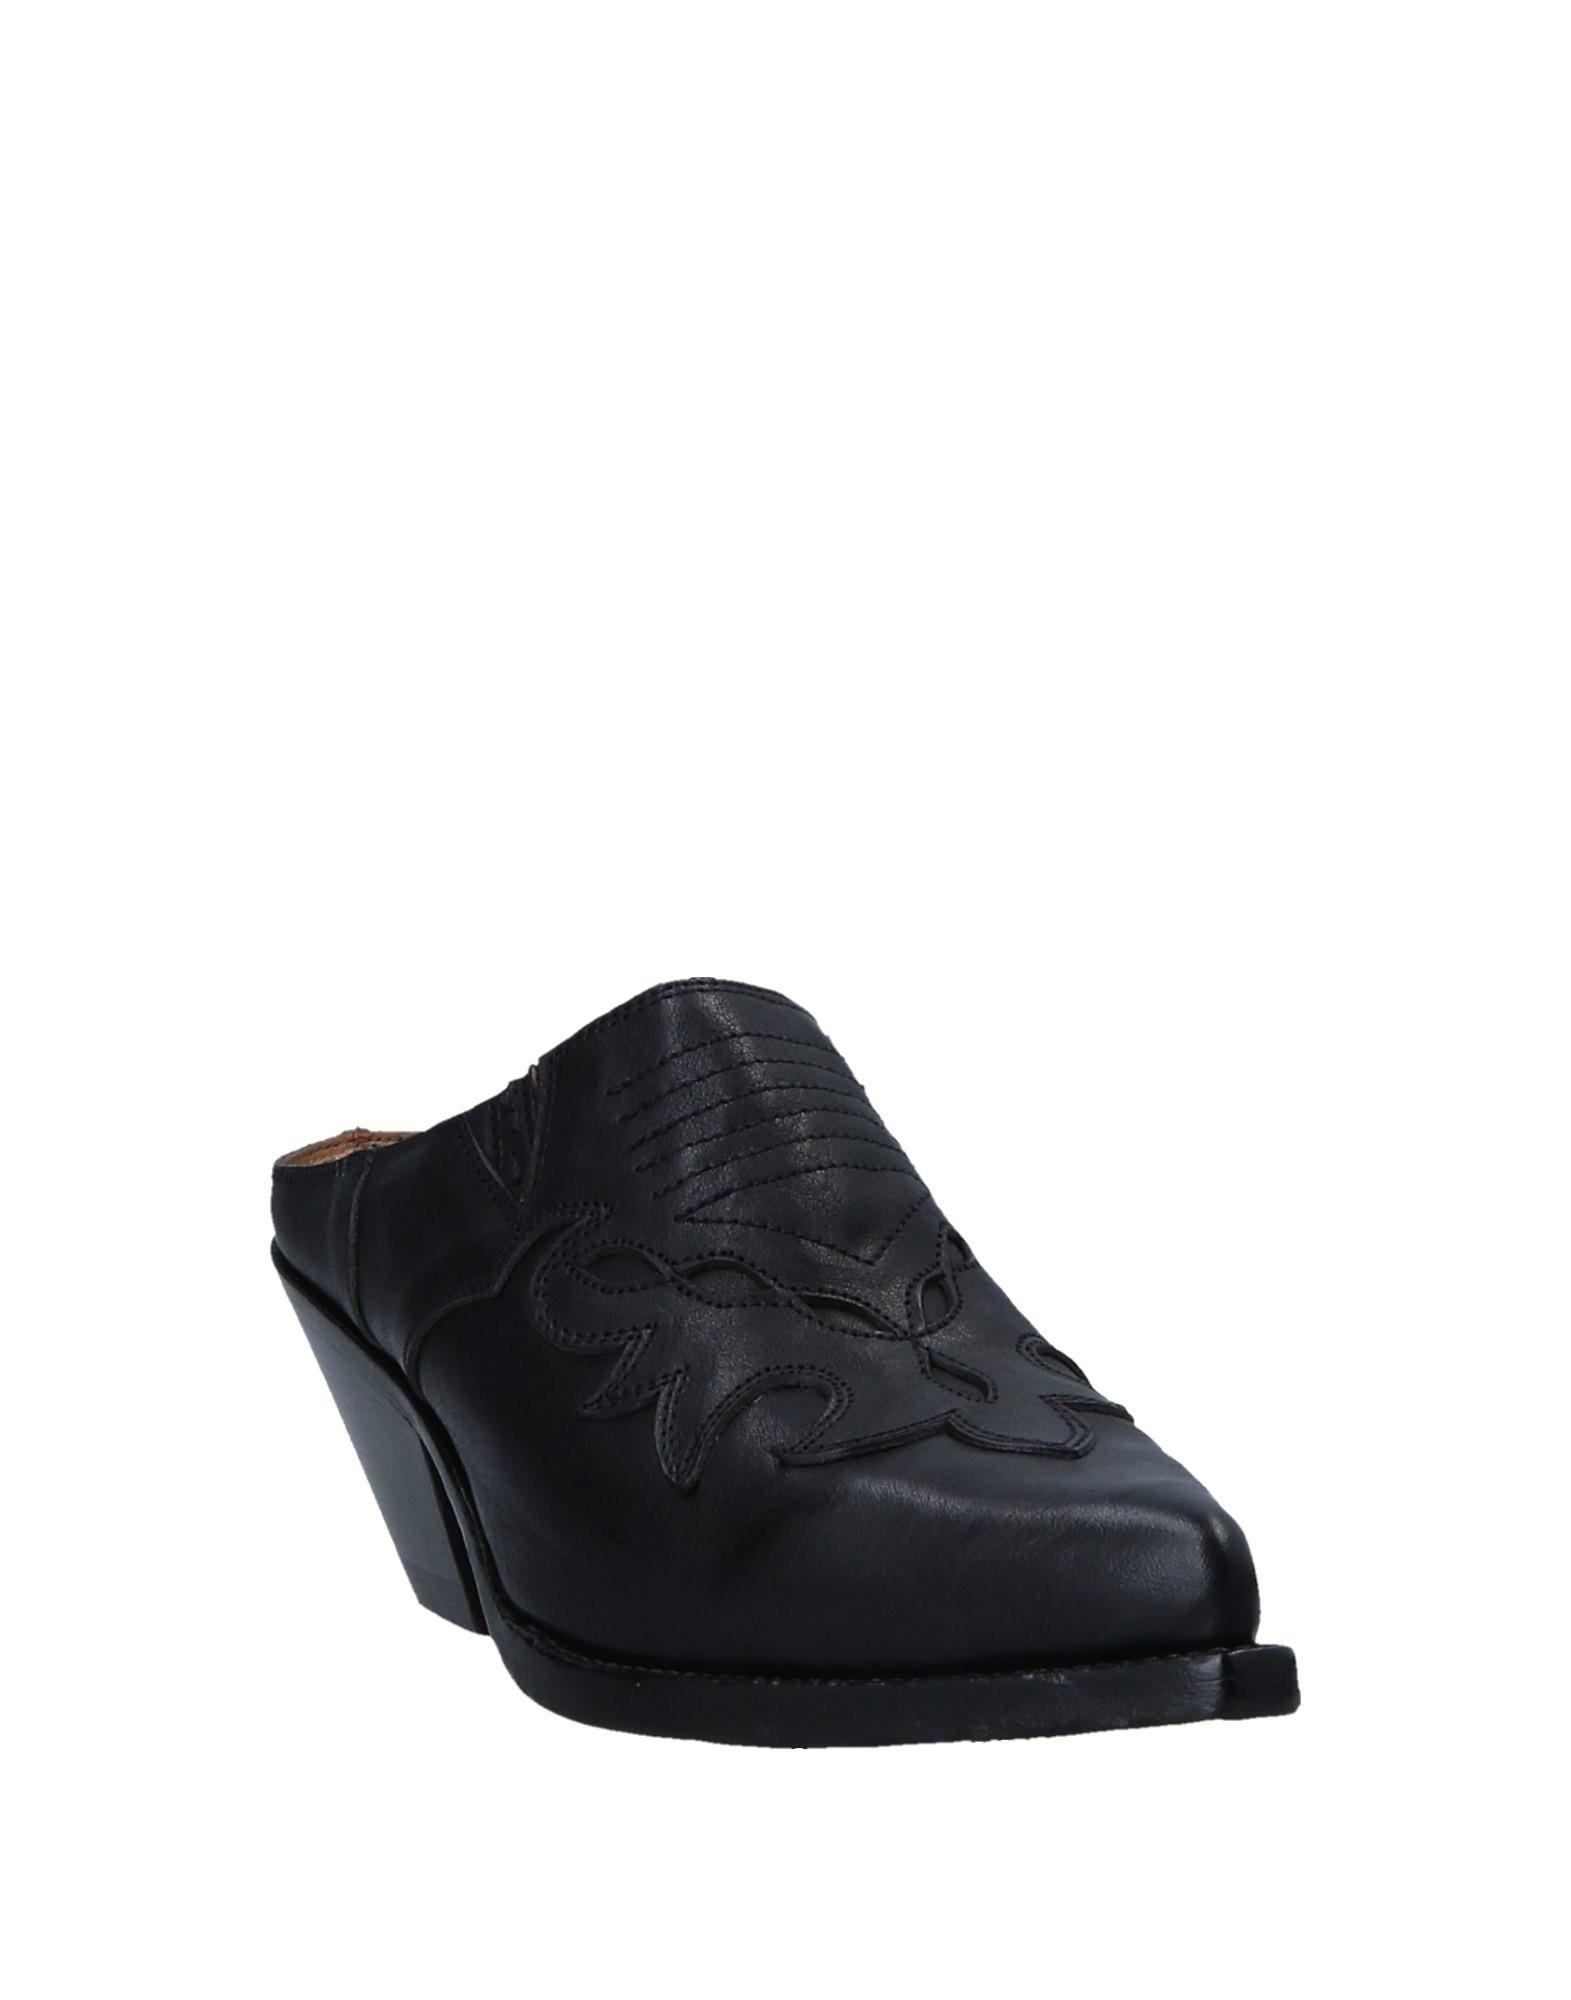 Buttero® Pantoletten Damen Schuhe  11562850HBGut aussehende strapazierfähige Schuhe Damen 8ddf3f